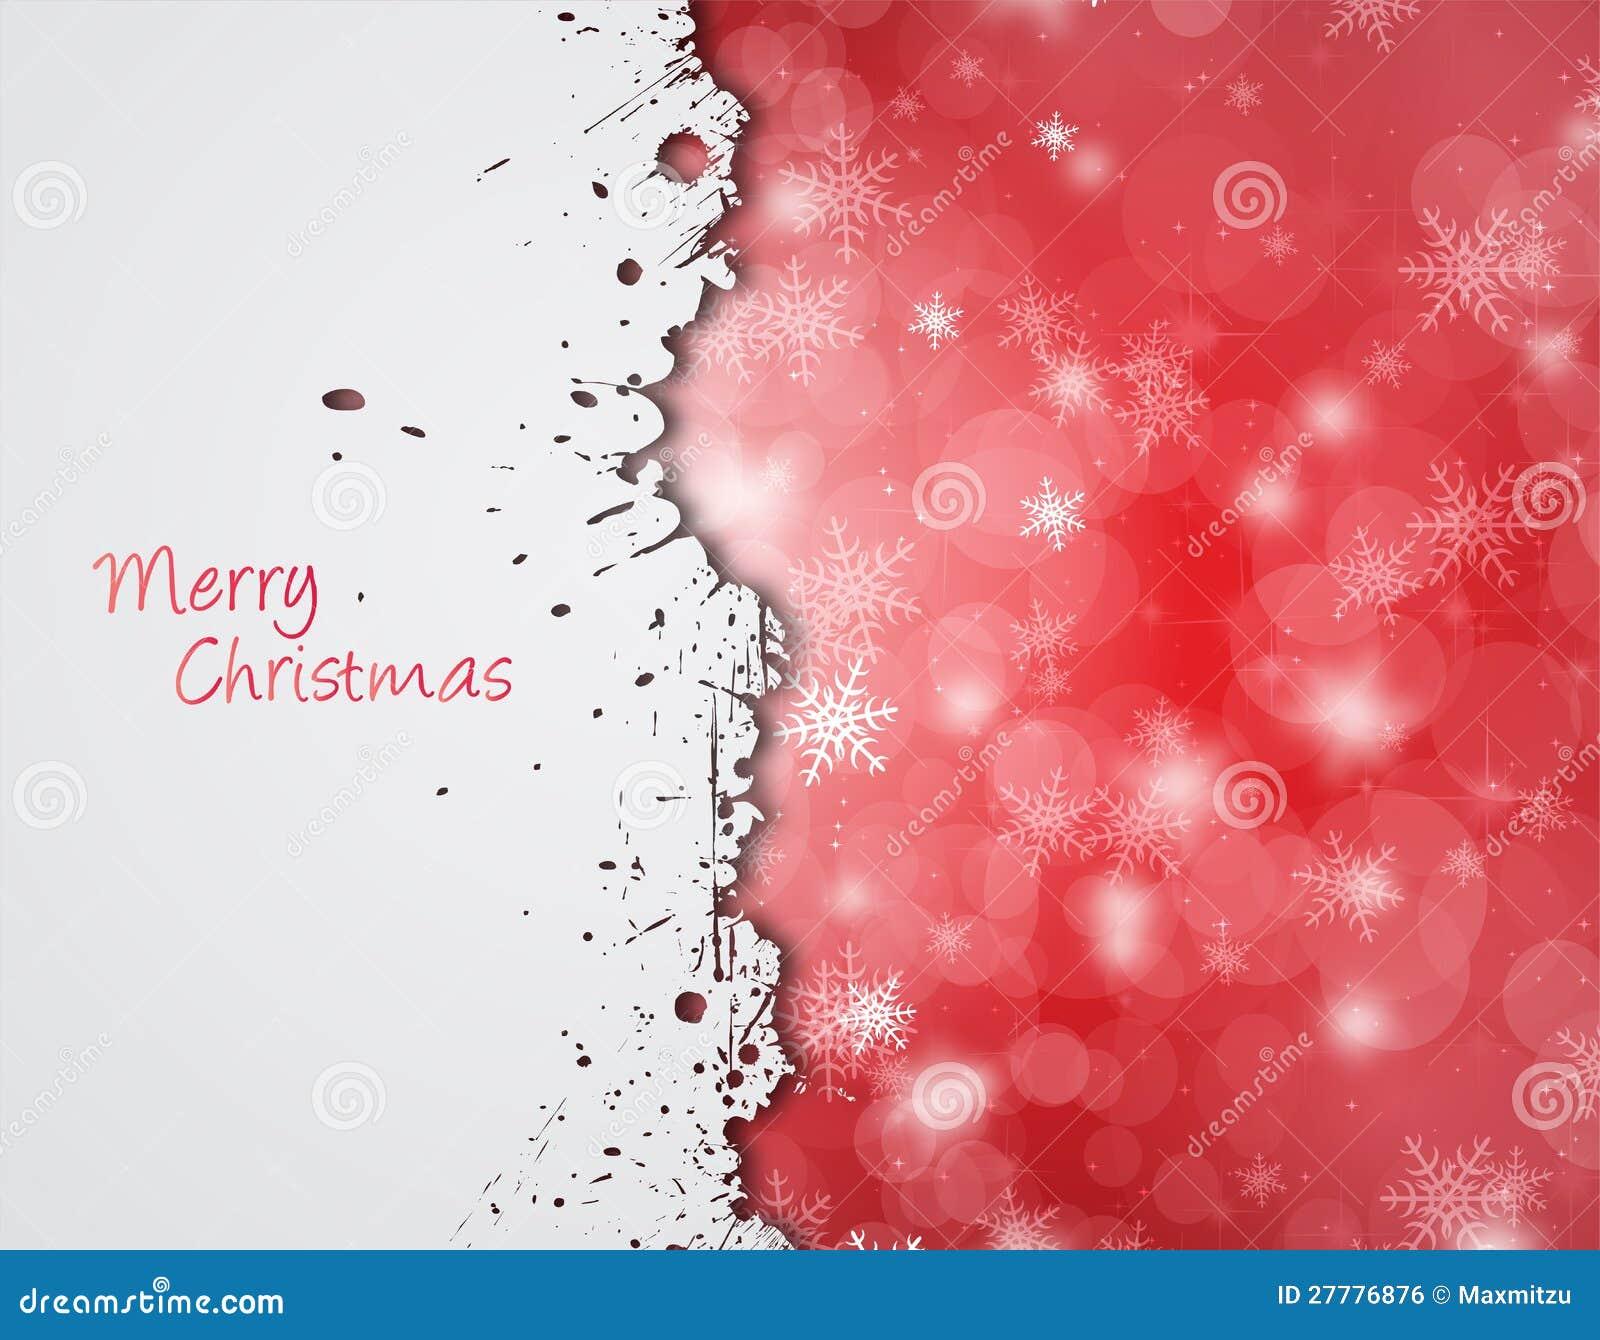 Grunge Christmas Wallpaper. Royalty Free Stock Image ...